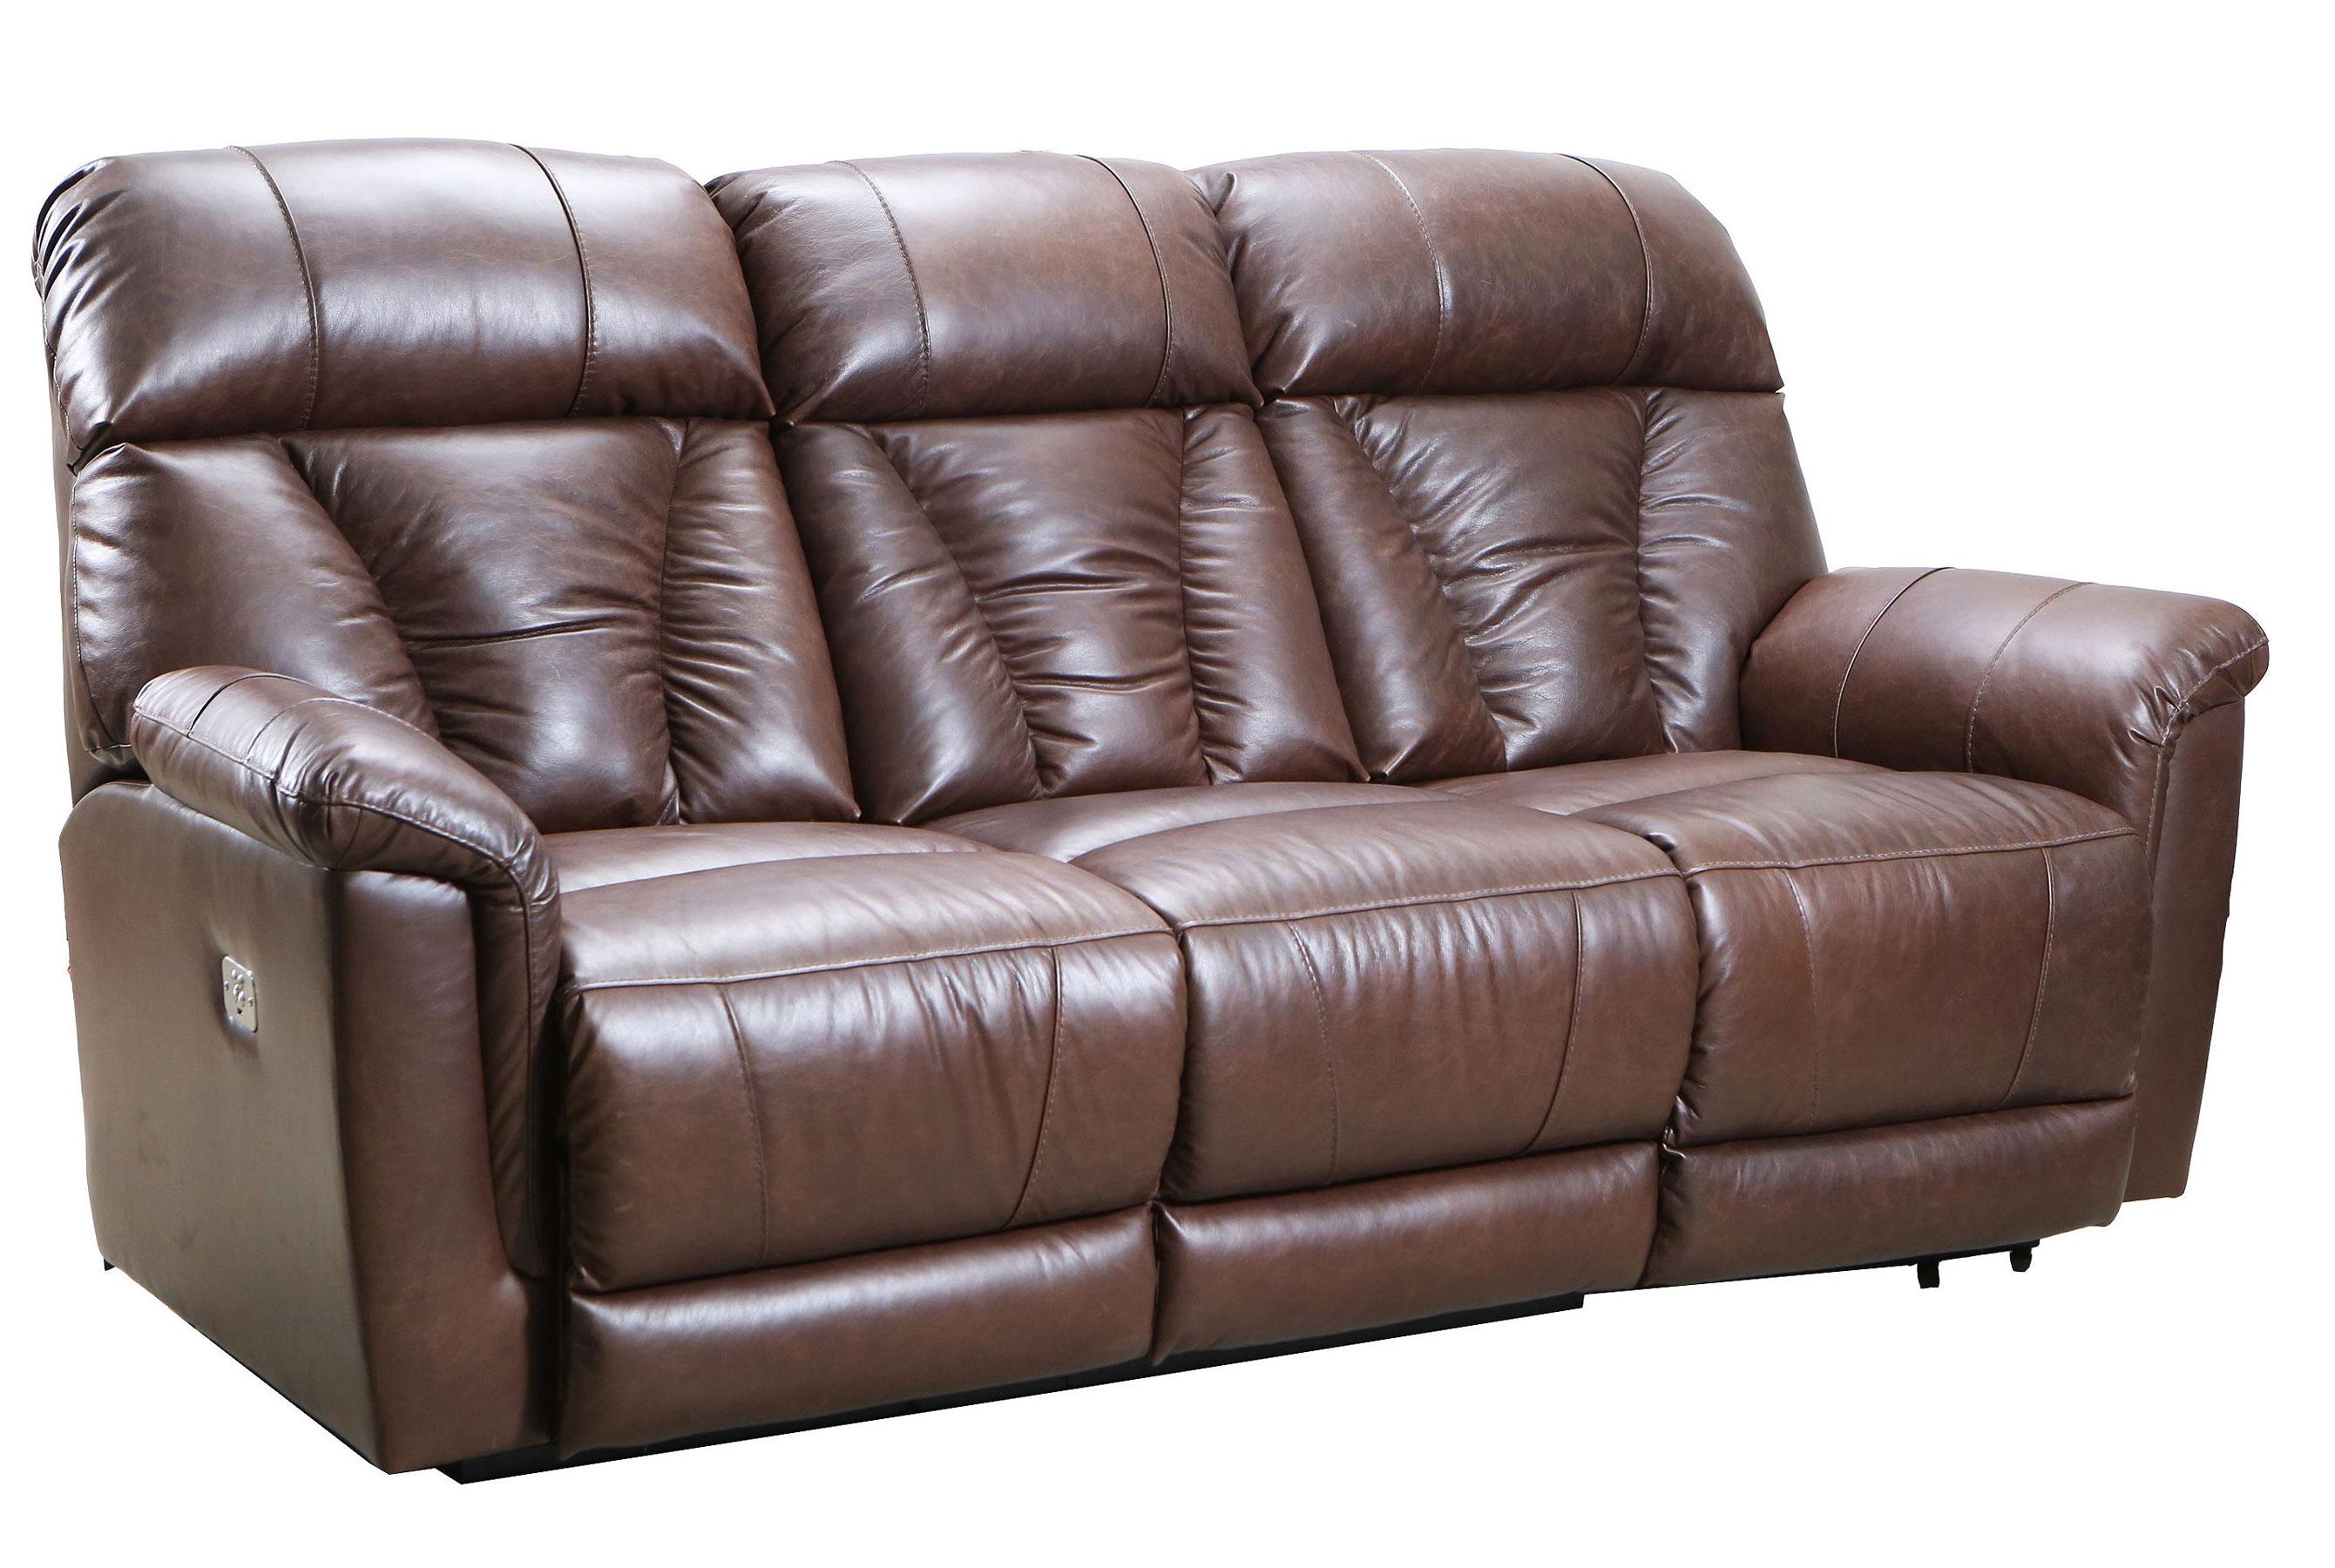 Mandalay 244 86 Reclining Sofa Sofas